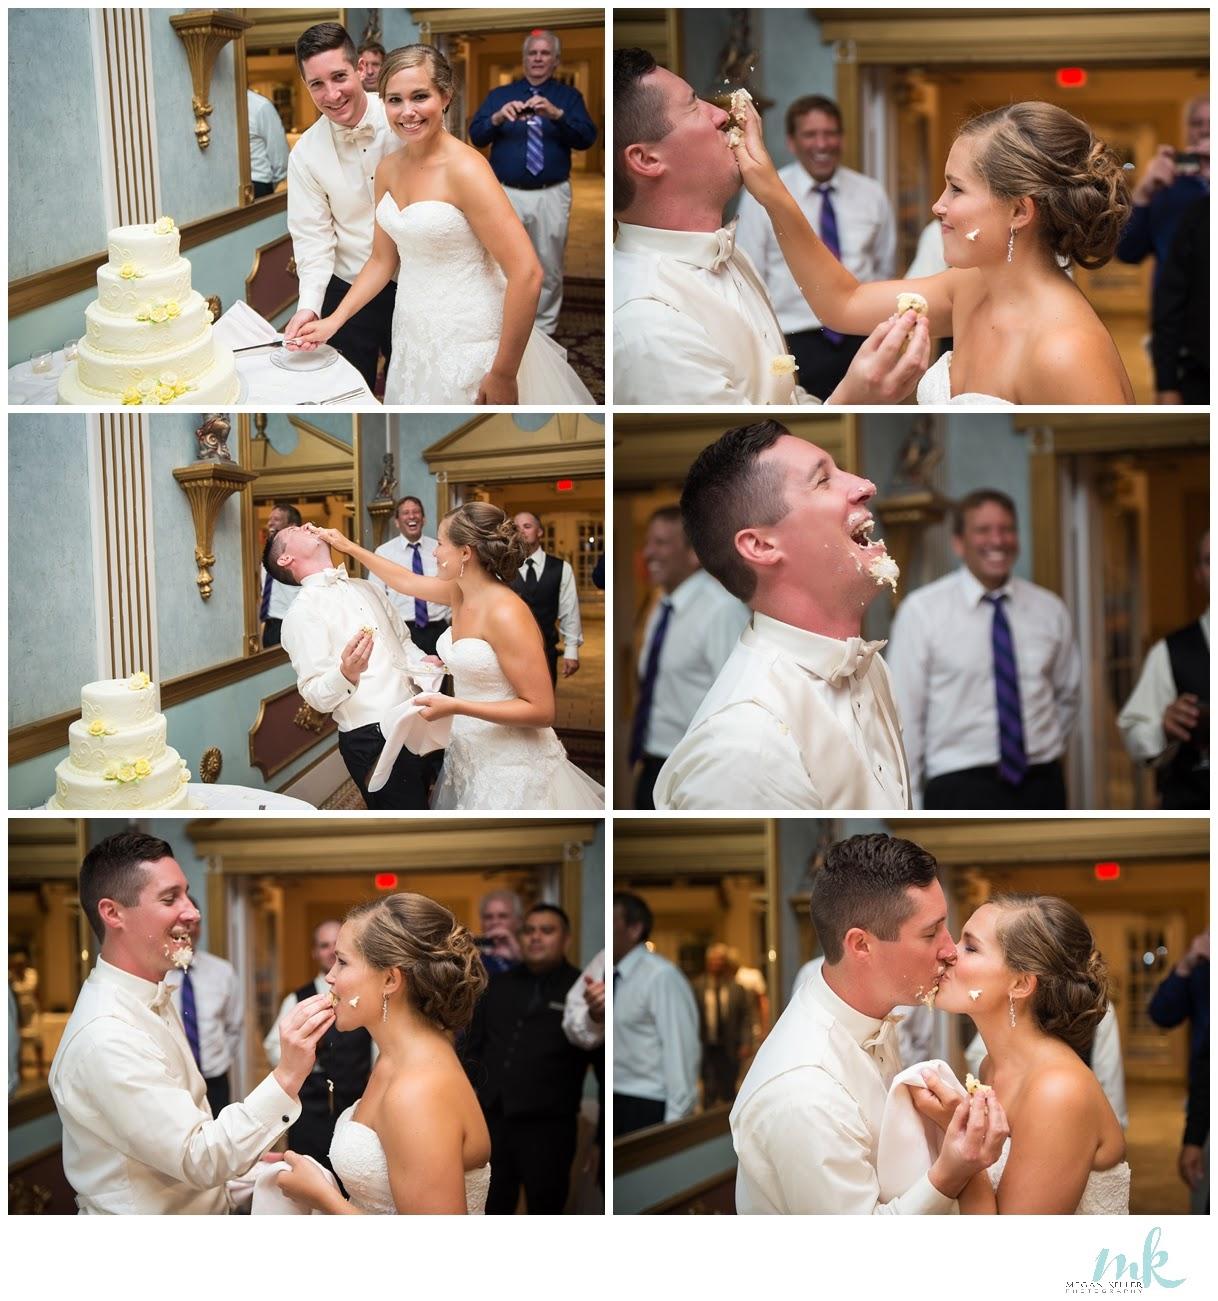 Danielle and Dan's wedding Danielle and Dan's wedding 2014 07 16 0027